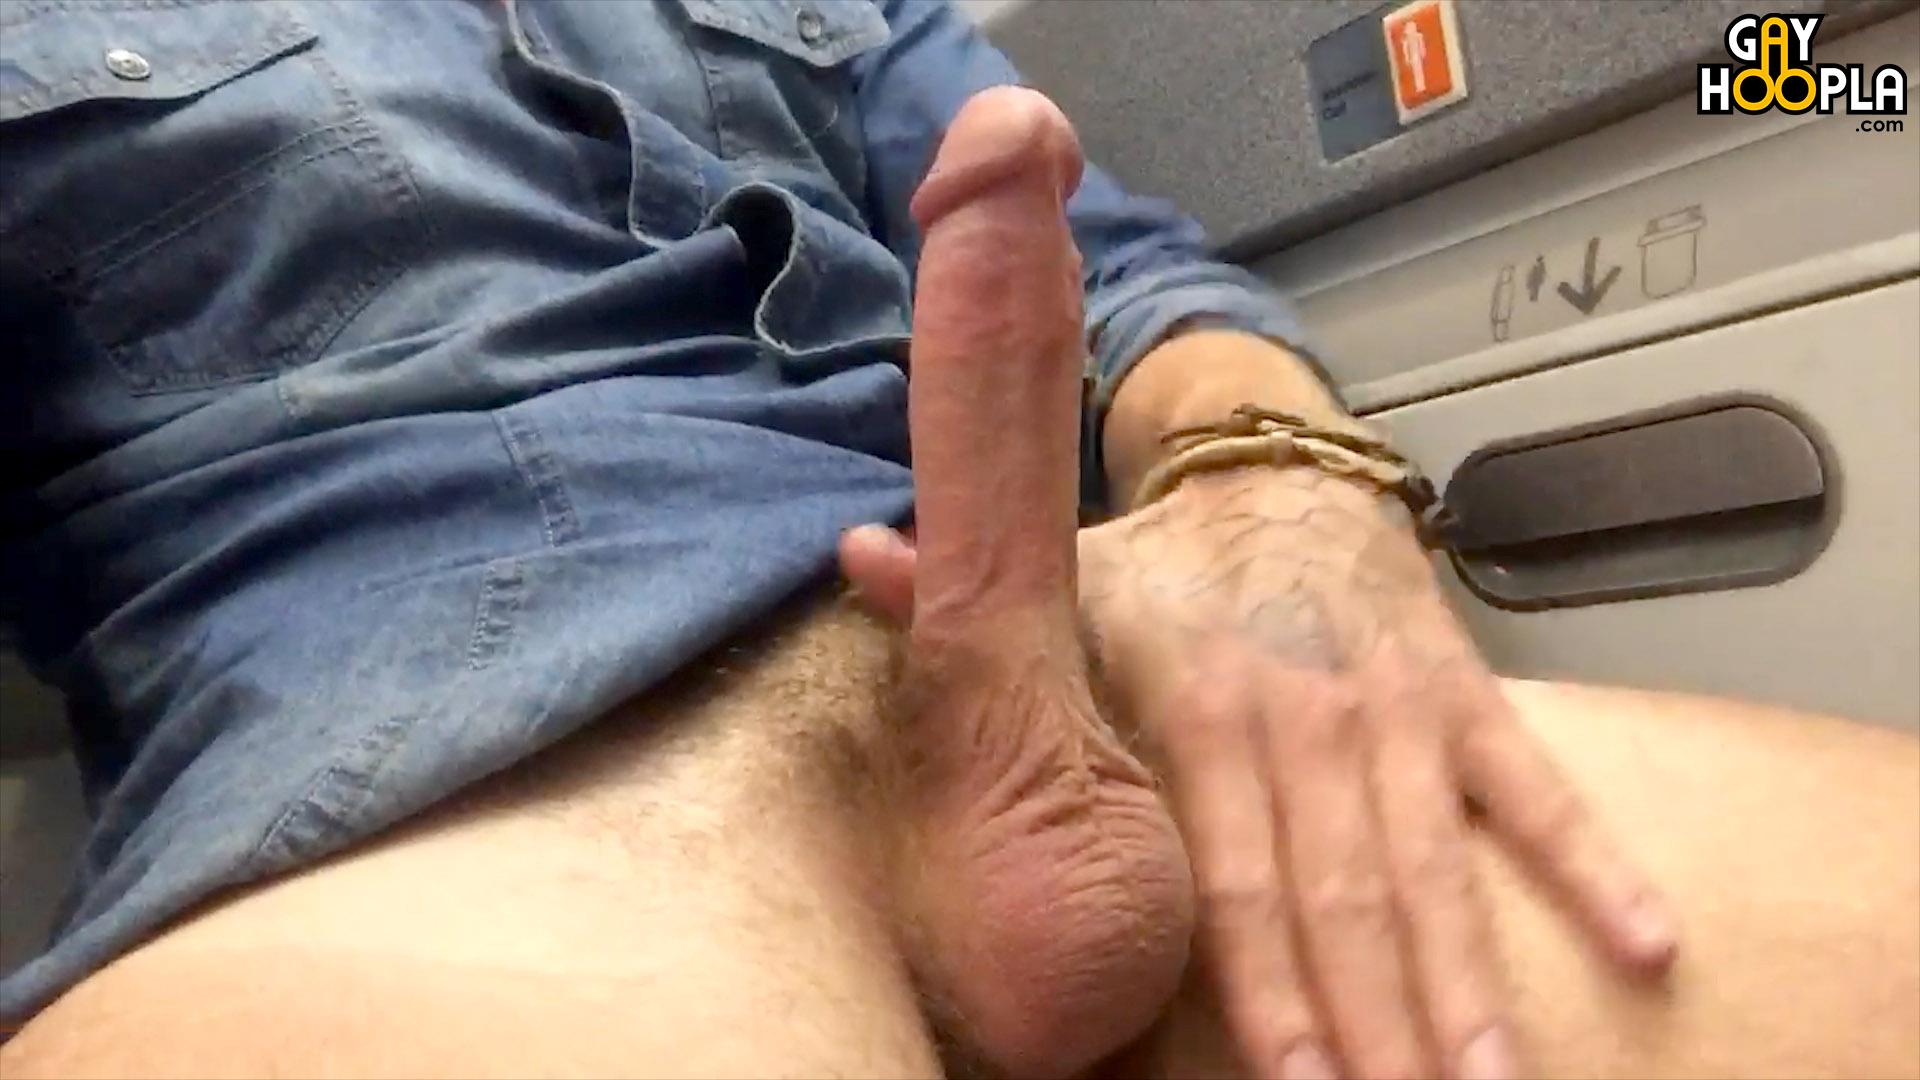 gayhoopla-price-hogan-airplane-15